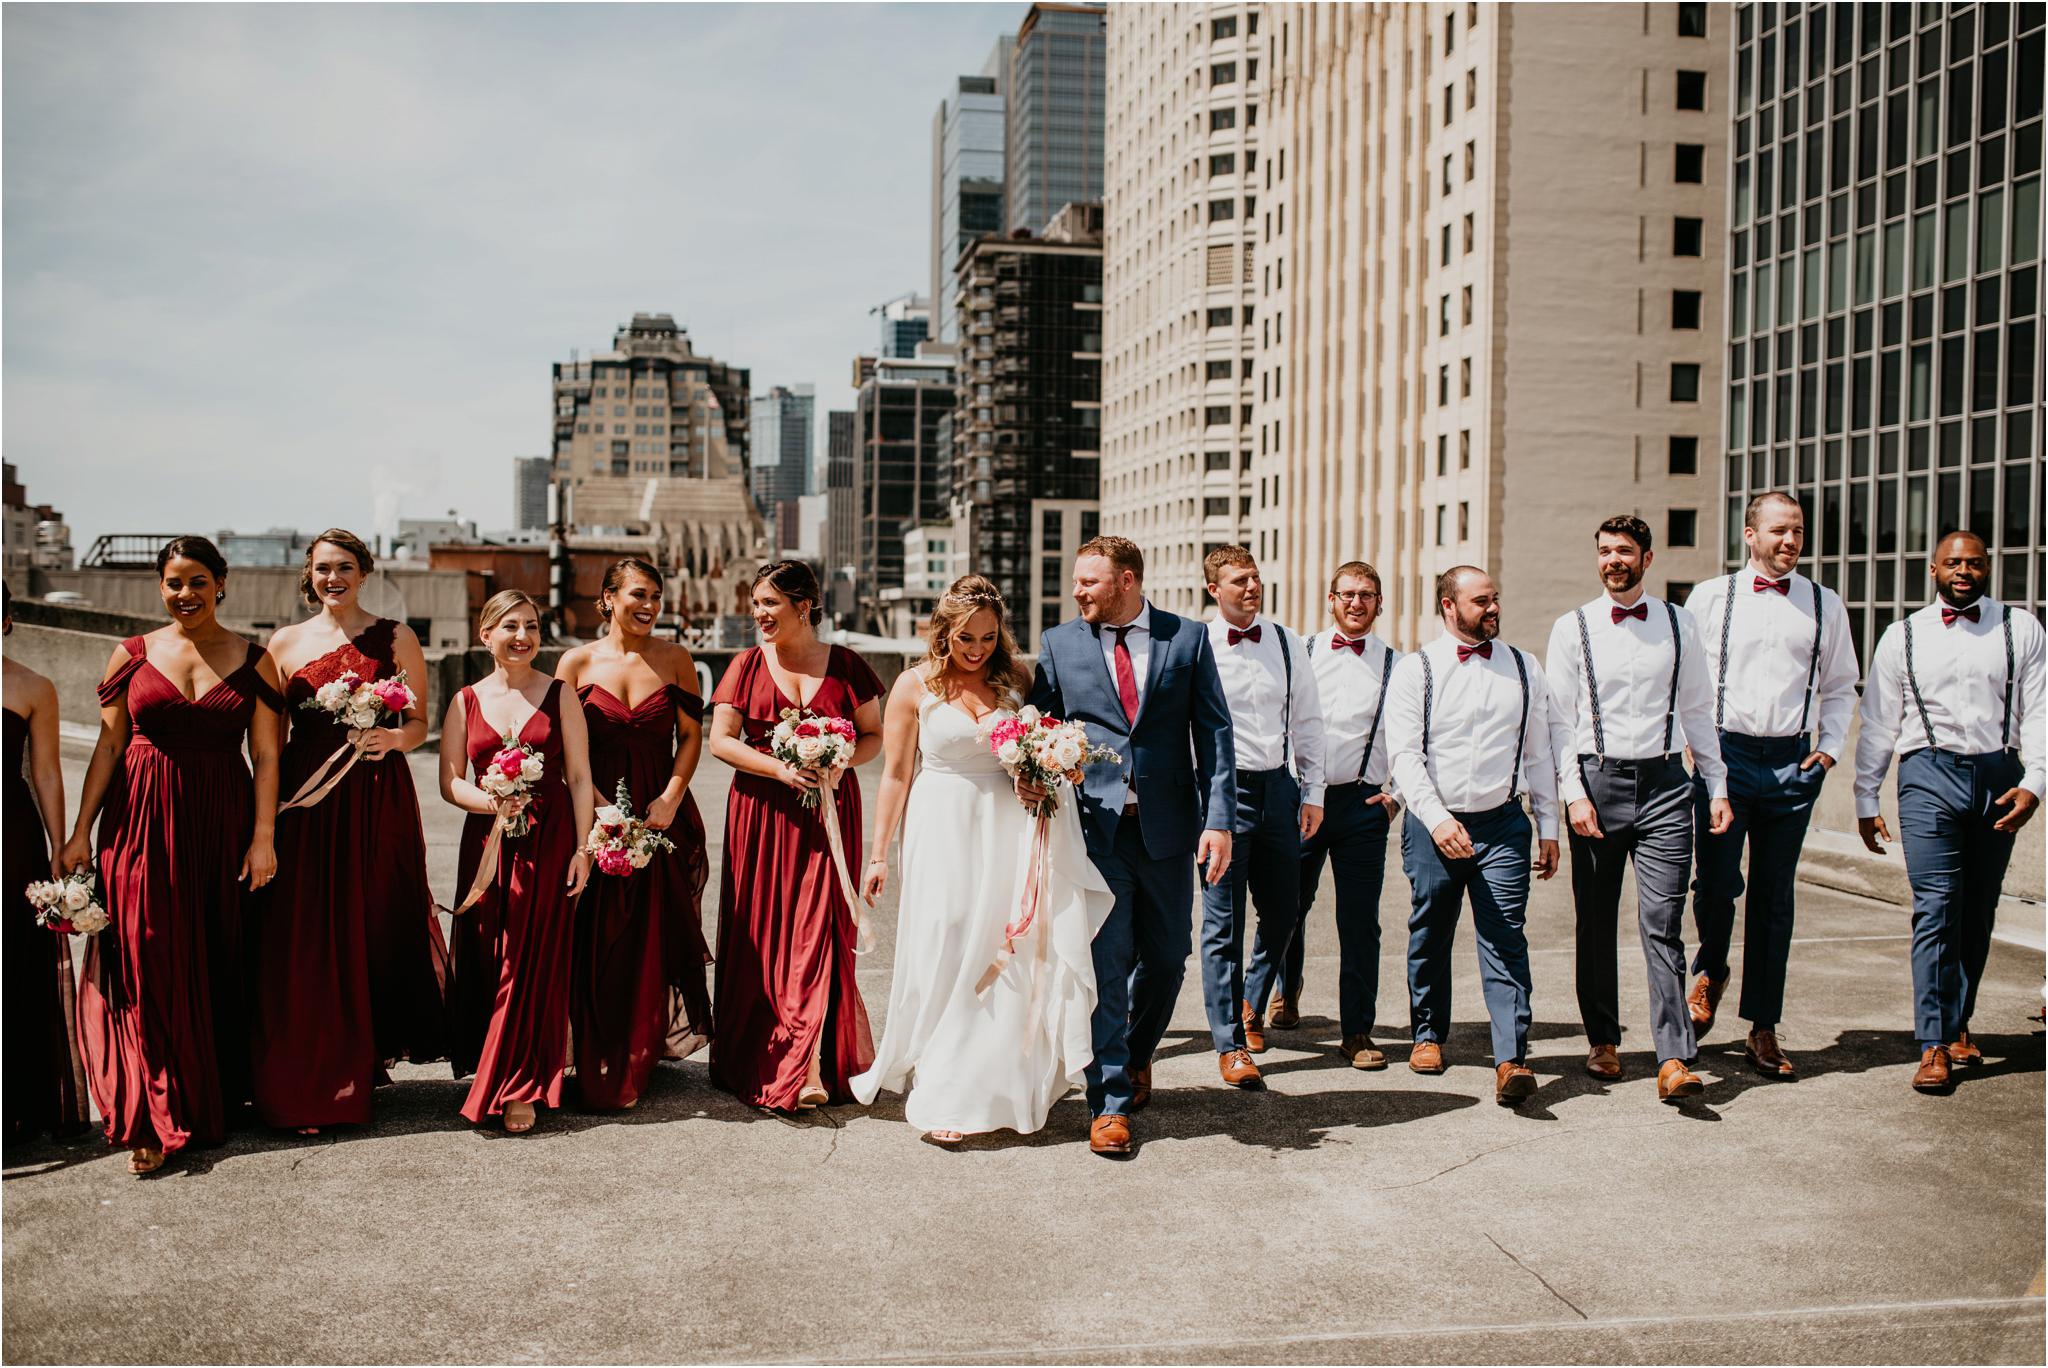 laura-and-matt-metropolist-urban-seattle-wedding-photographer-046.jpg